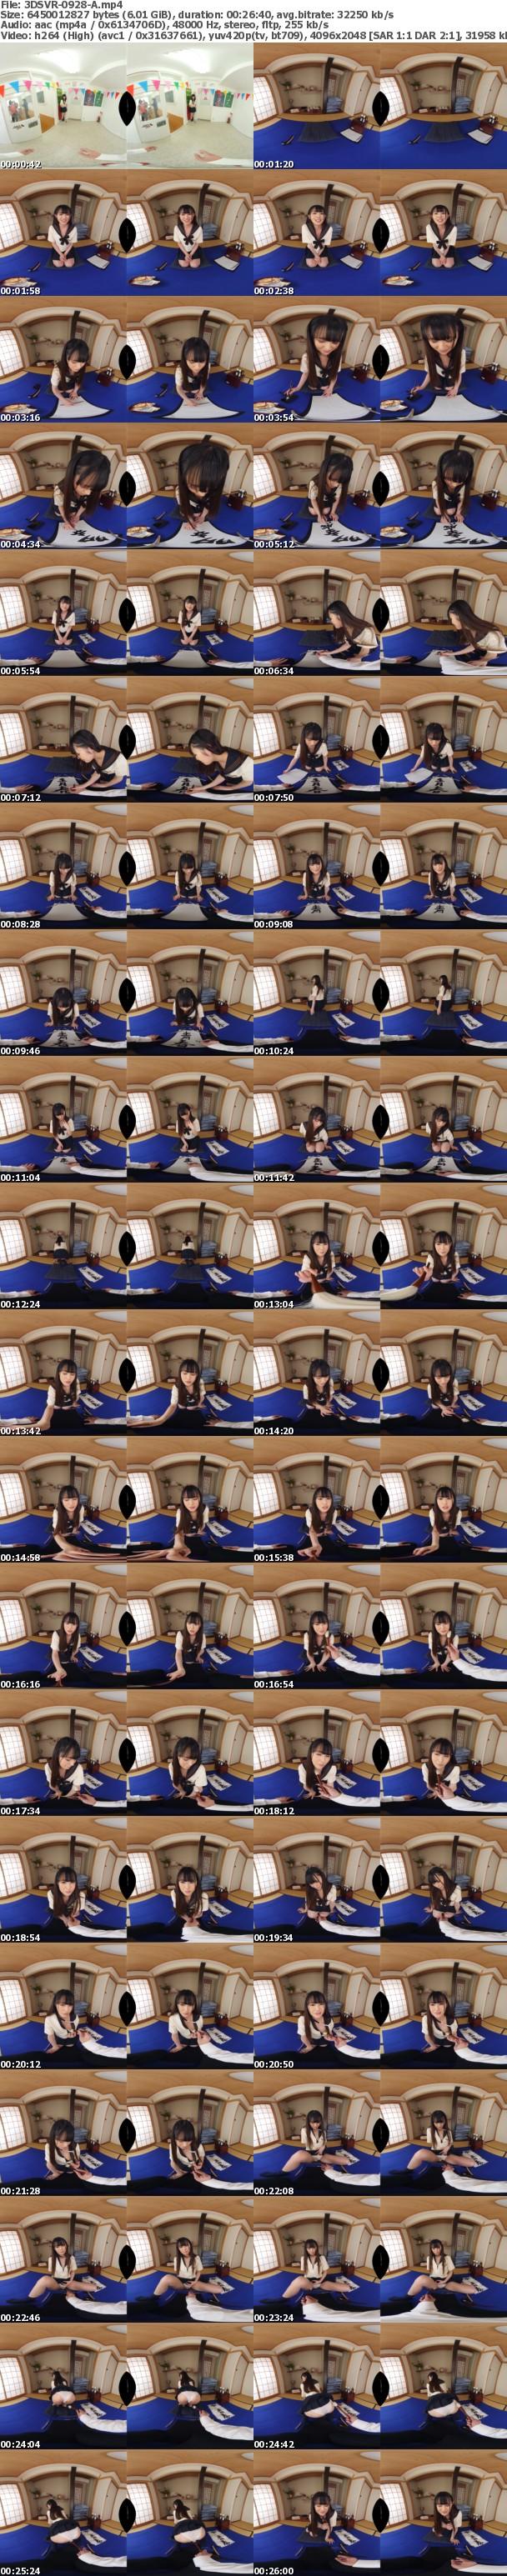 (VR) 3DSVR-0928 柊木楓 初VR ノーブラ制服、故意的なチラ見せで1年生を勧誘しちゃう書道部部長。優柔不断の僕に耳元、乳首、アソコの魅惑の3点責め。挿れたら入部の悶絶焦らしセックス